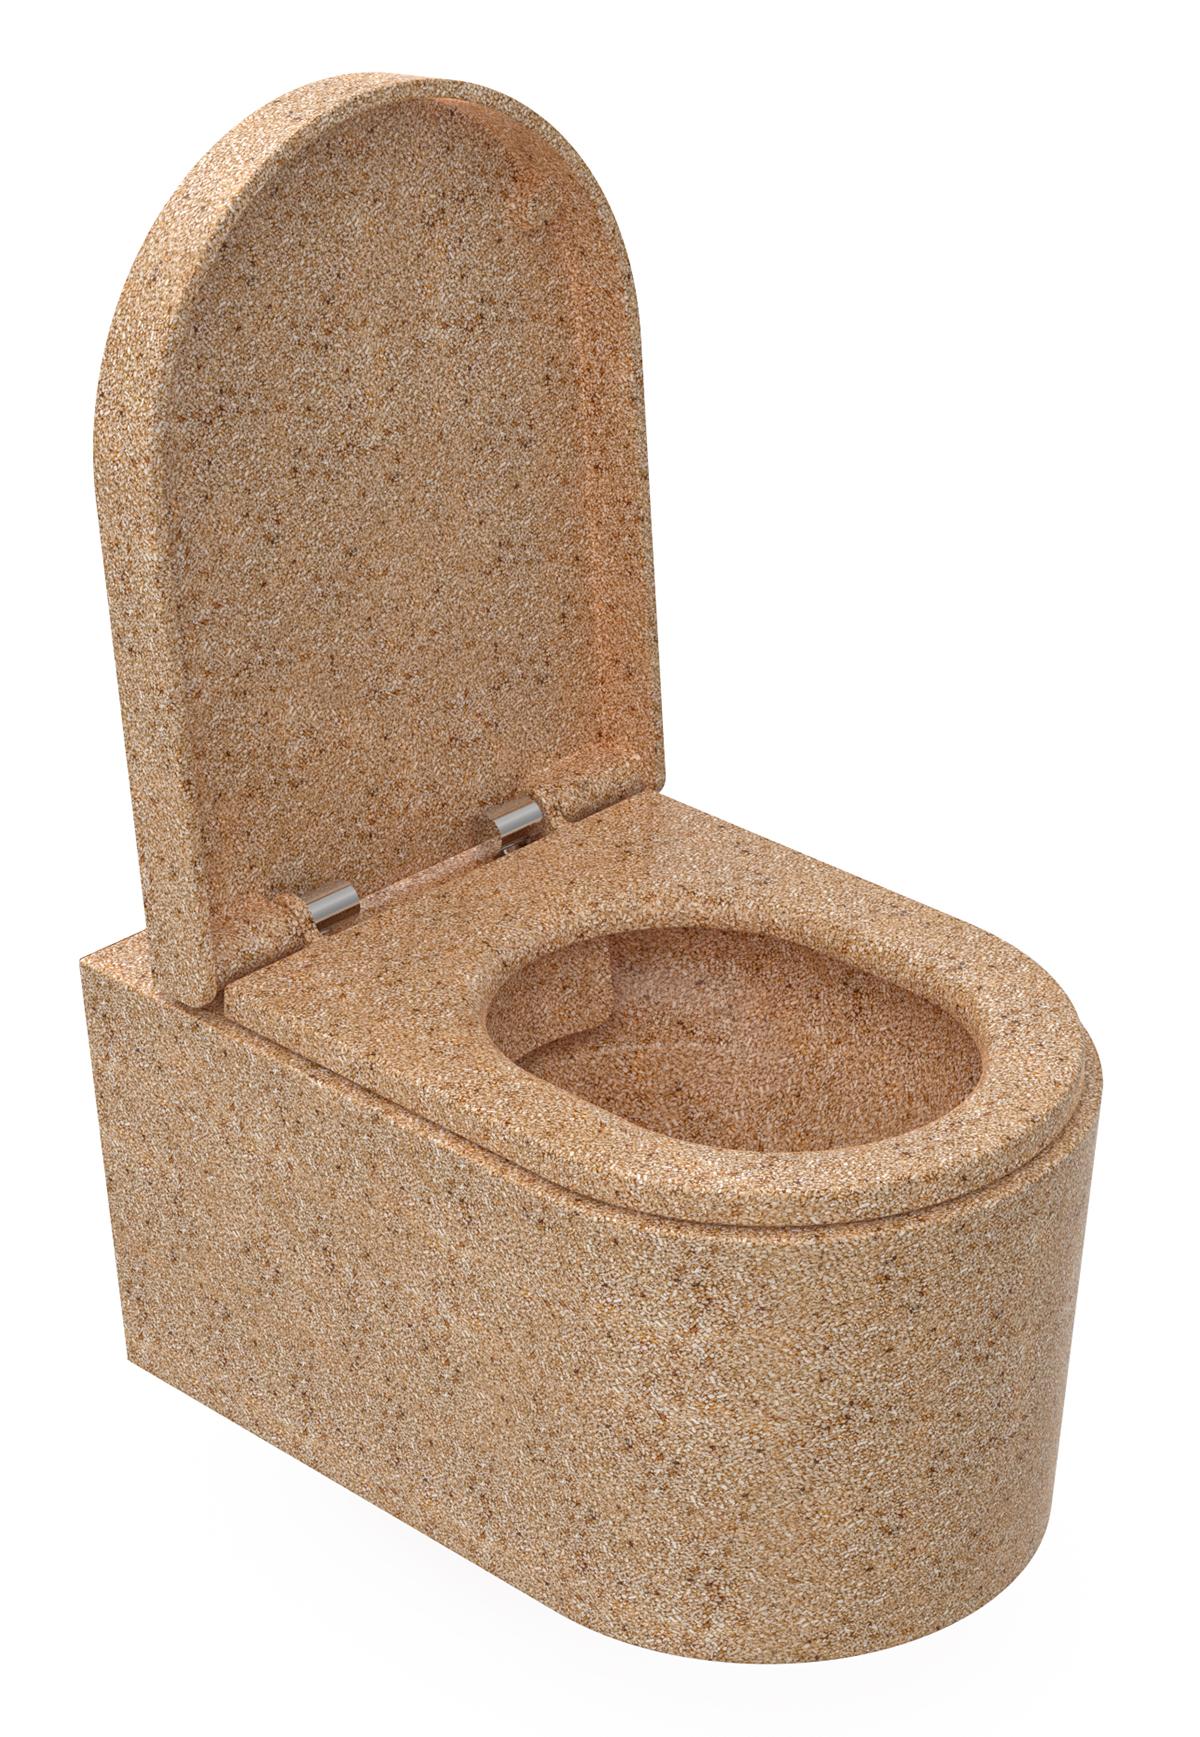 Woodion puupohjainen WC-istuin. Kuva: Woodio